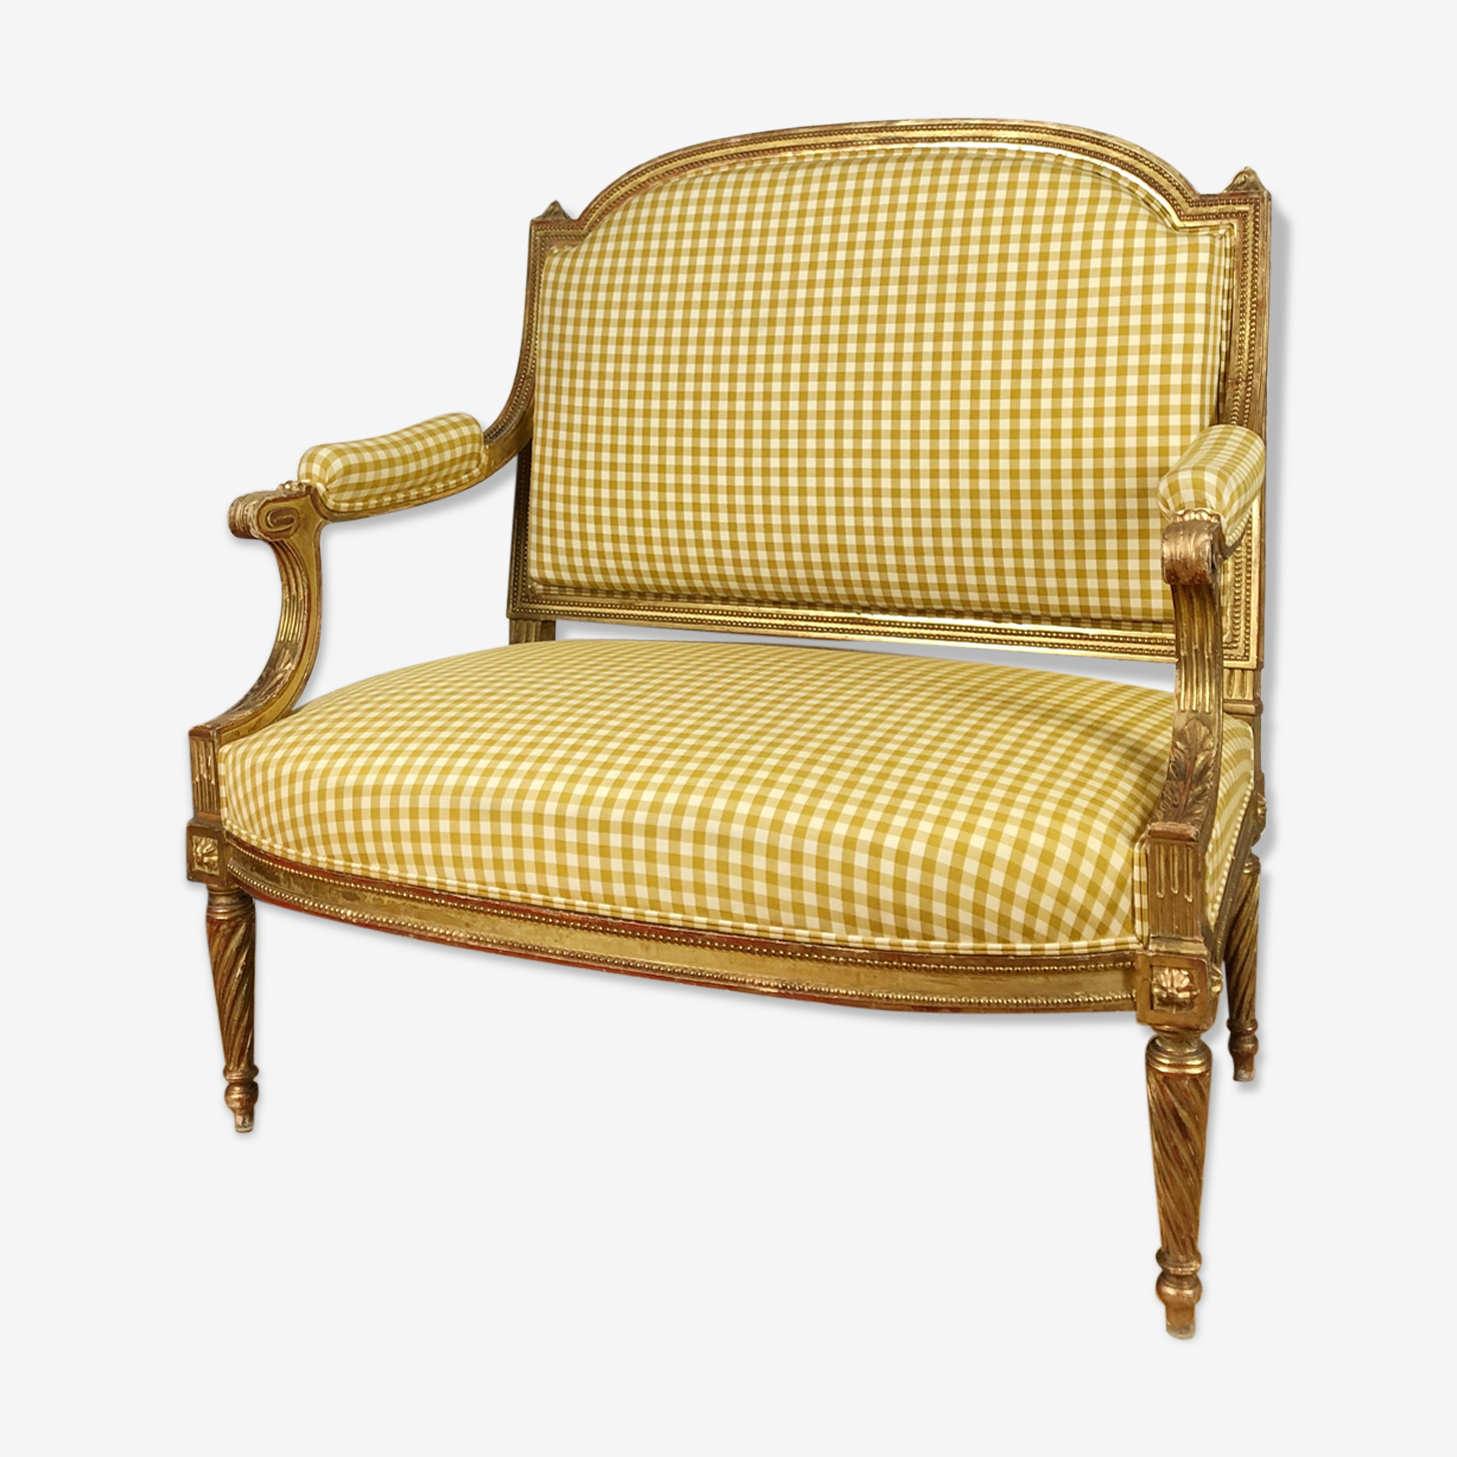 Marquise banquette d'époque Napoléon III de style Louis XVI